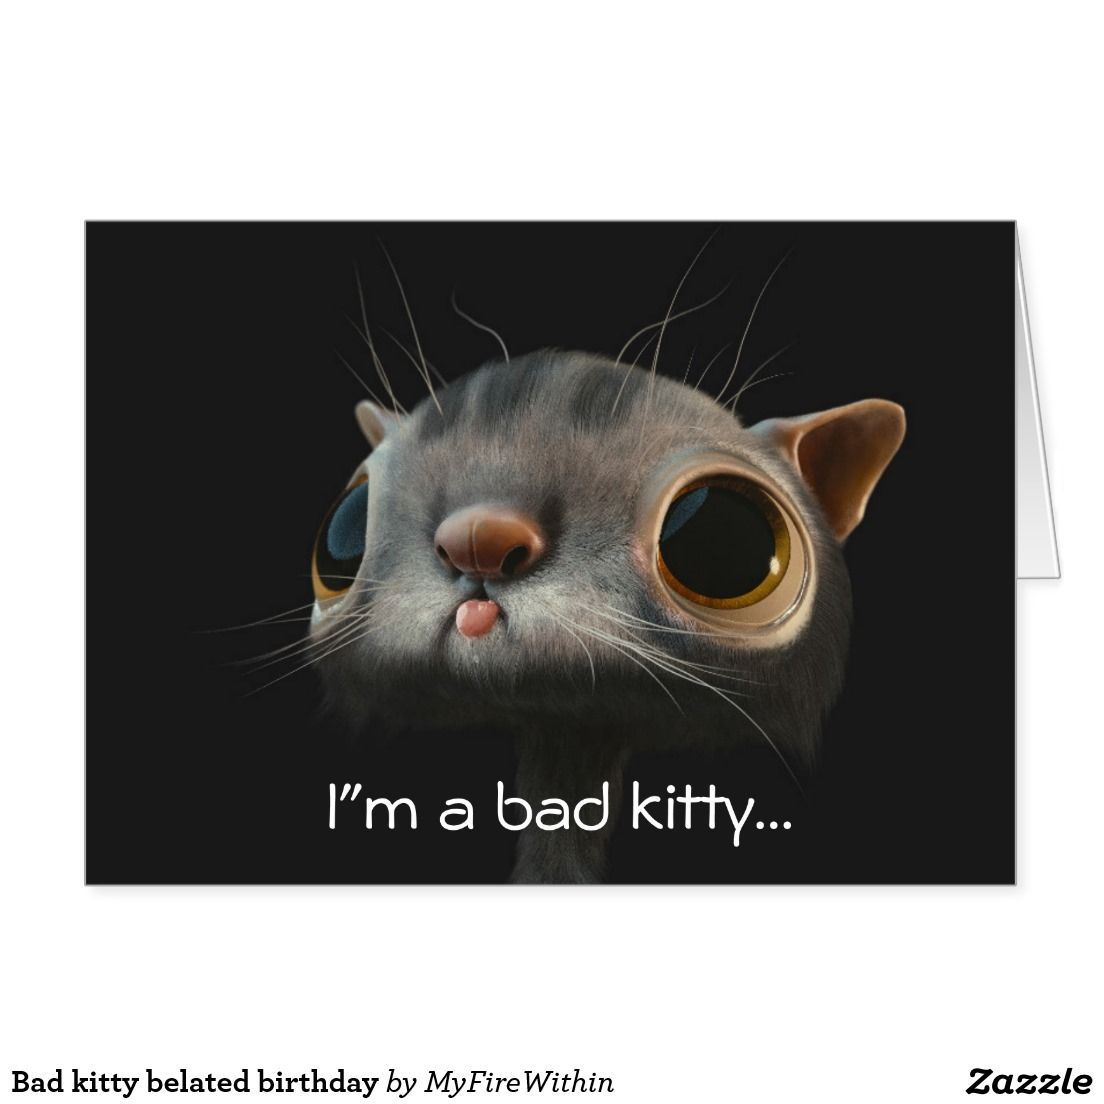 Bad kitty belated birthday card dakota inspired customizable bad kitty belated birthday card kristyandbryce Image collections